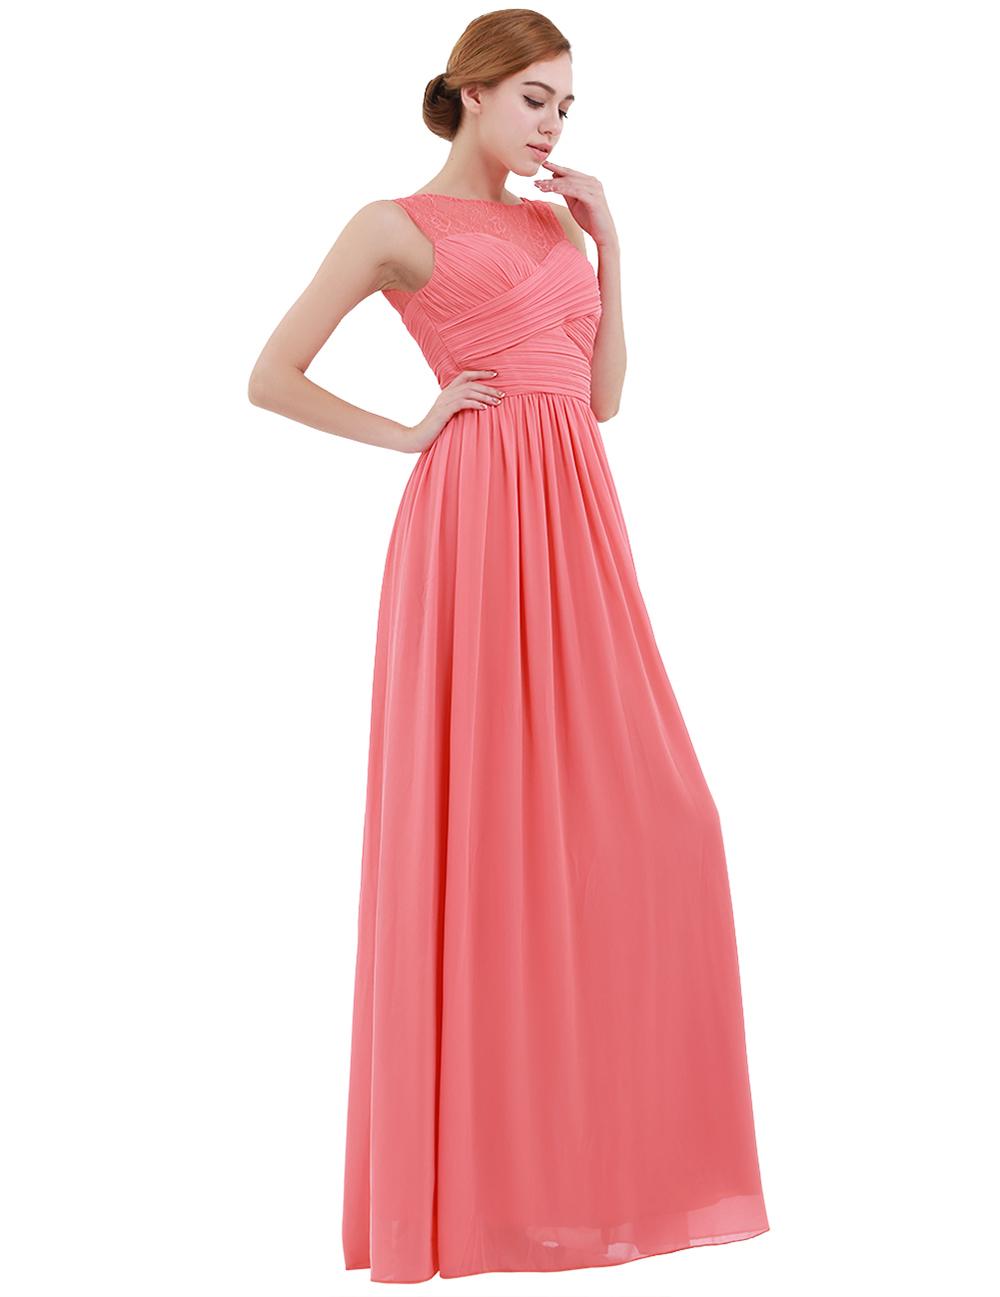 iEFiEL Women s Chiffon Dress Lace Long Dress for Evening Maxi Dress Wedding Prom  Gown Vestido de festa Birthday Party Dress 038cd7f16b0d